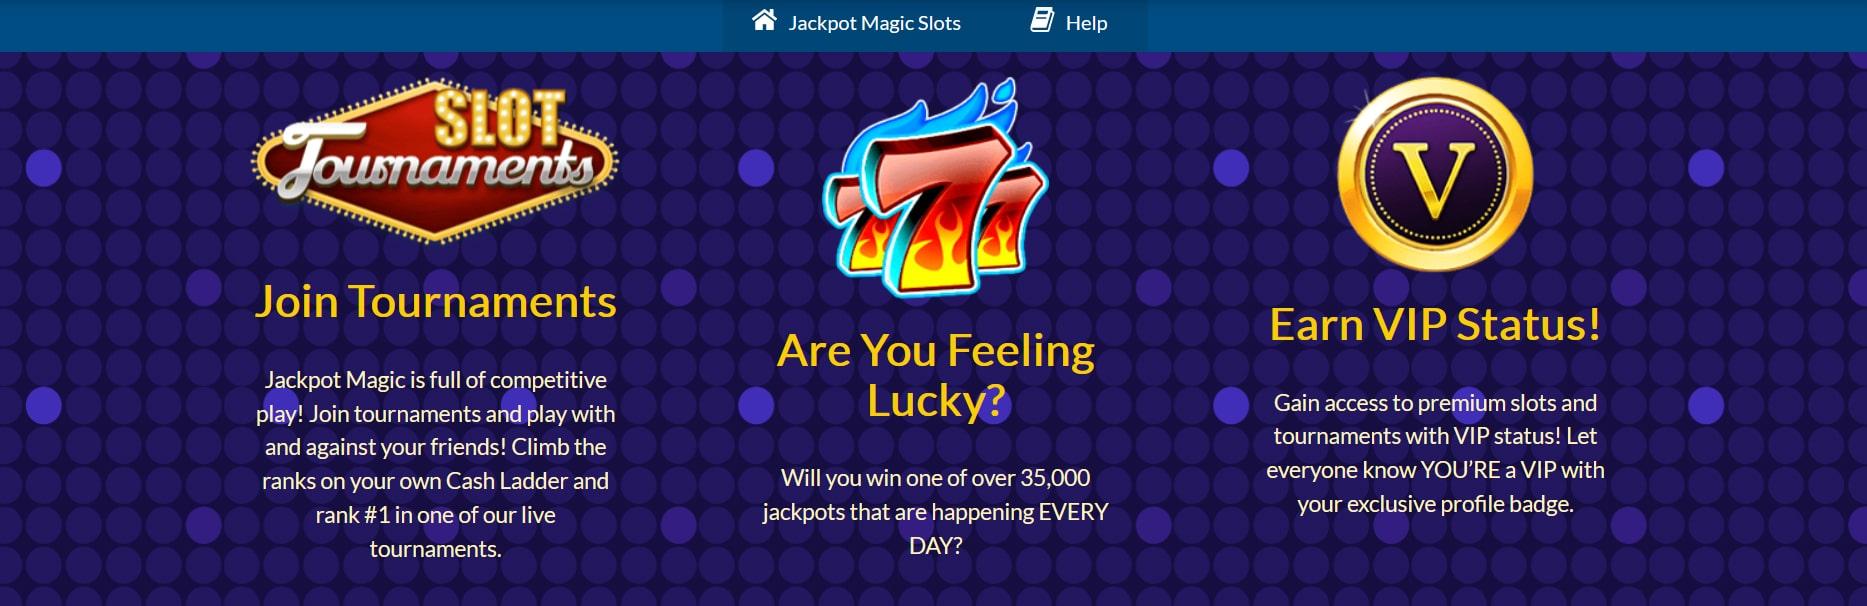 Jackpot Magic Slots VIP Program